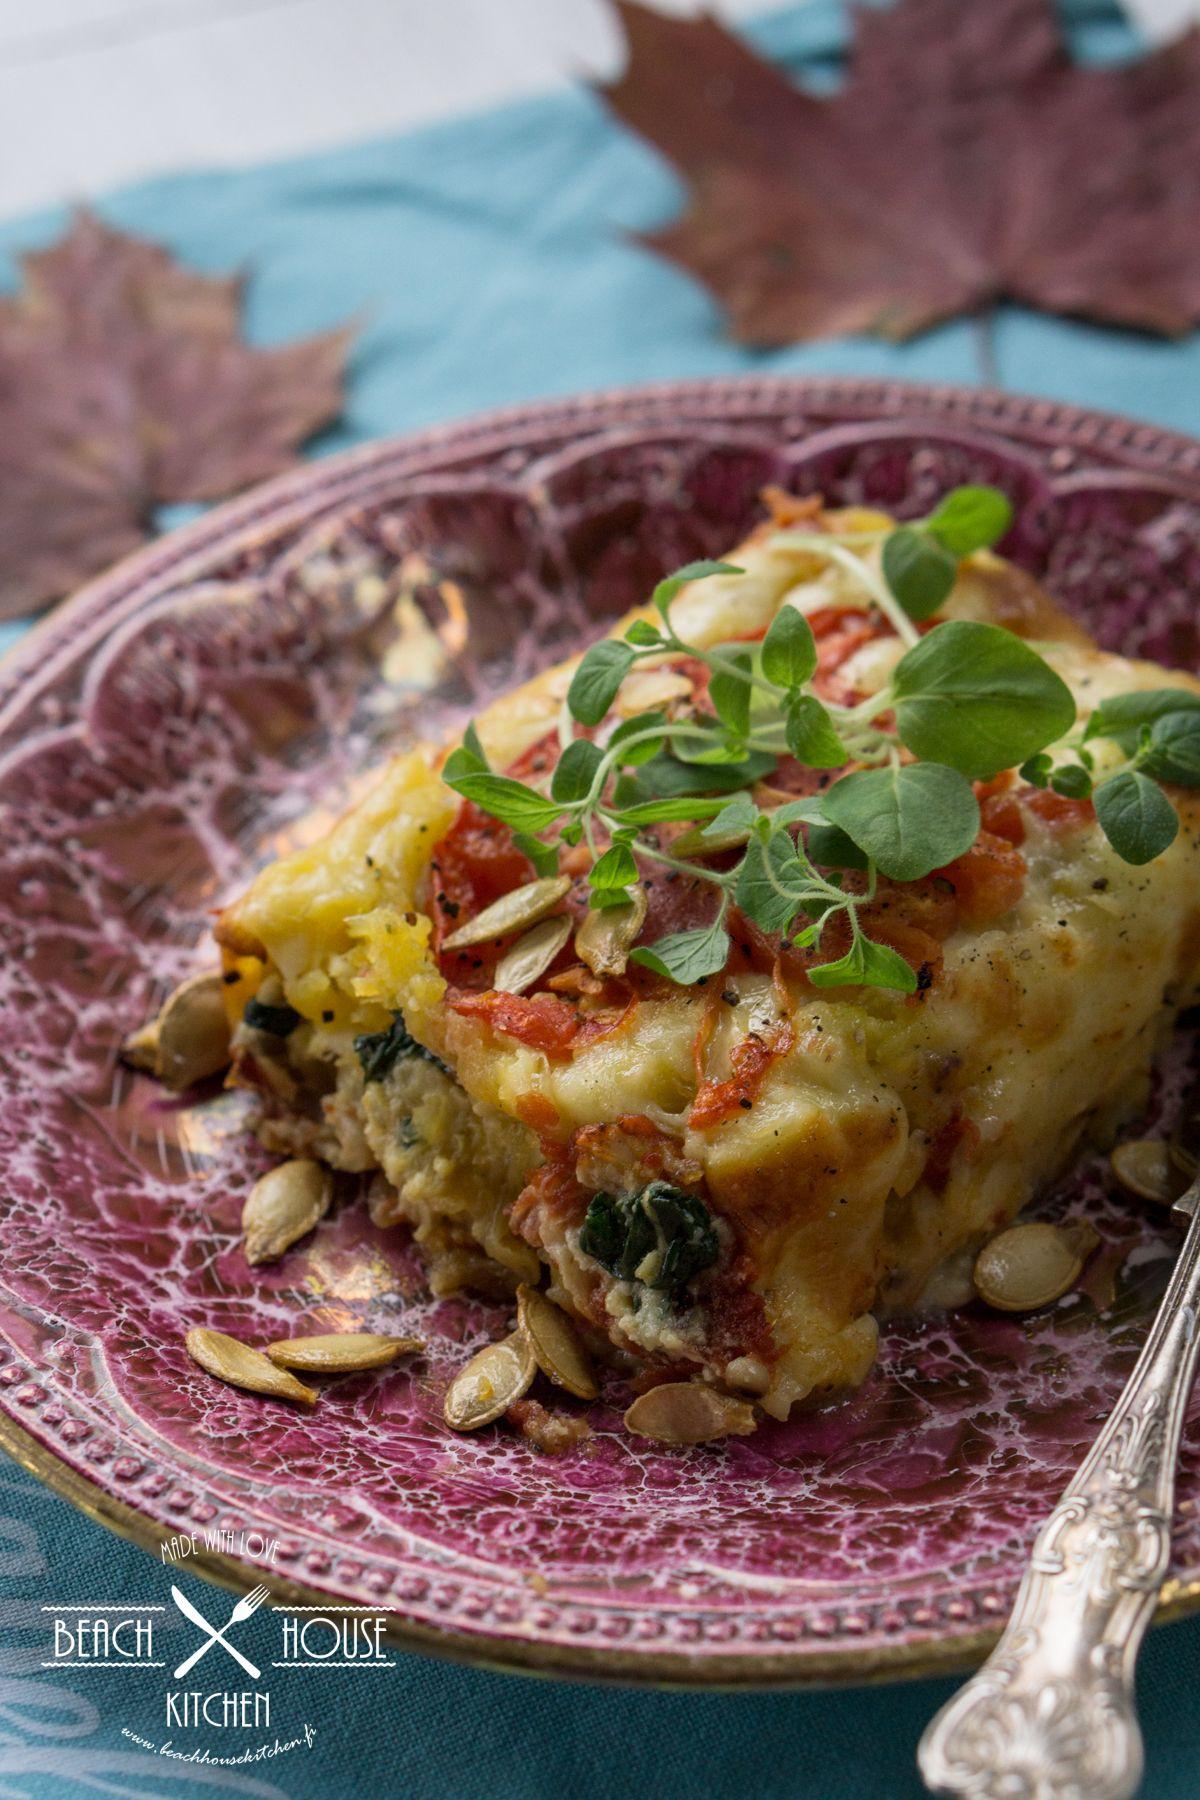 Beach house kitchen: Täyteläiset Kurpitsa-Cheddar Cannellonit